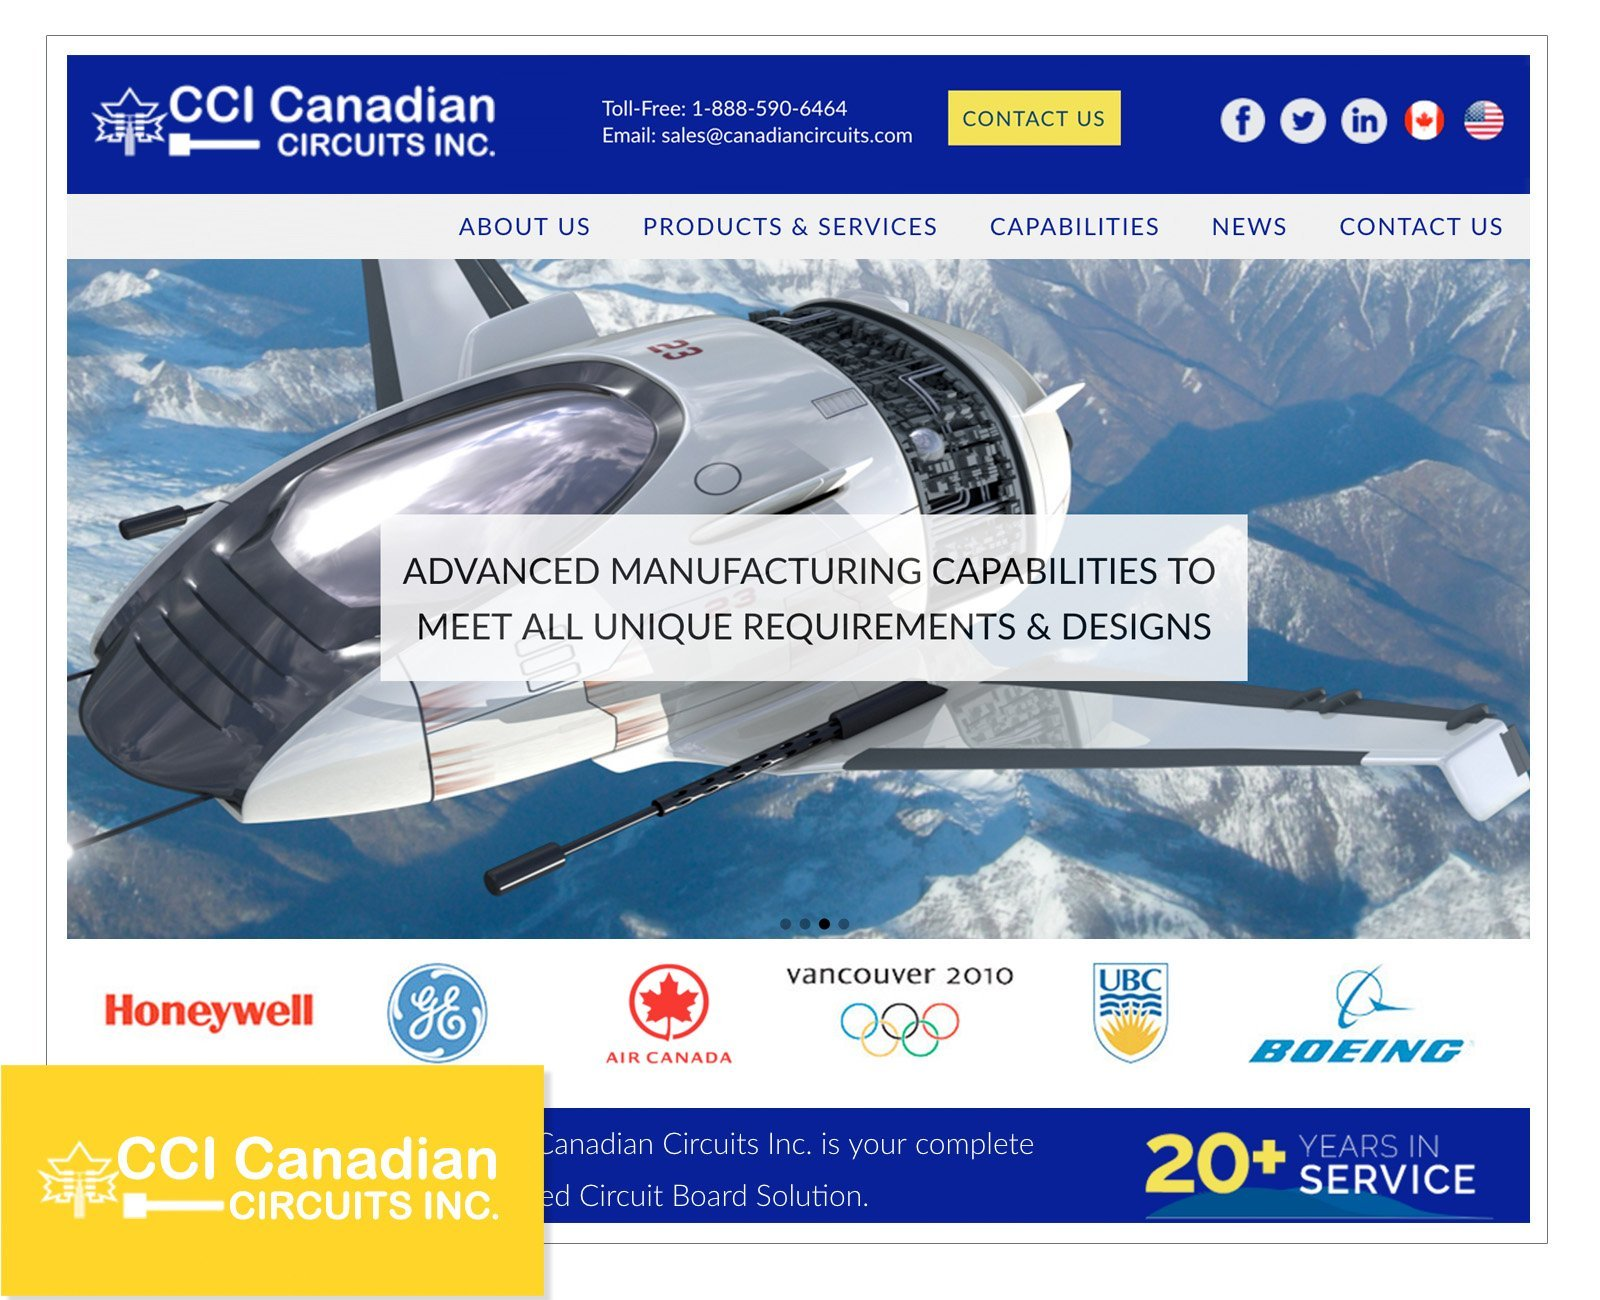 corporate web design vancouver